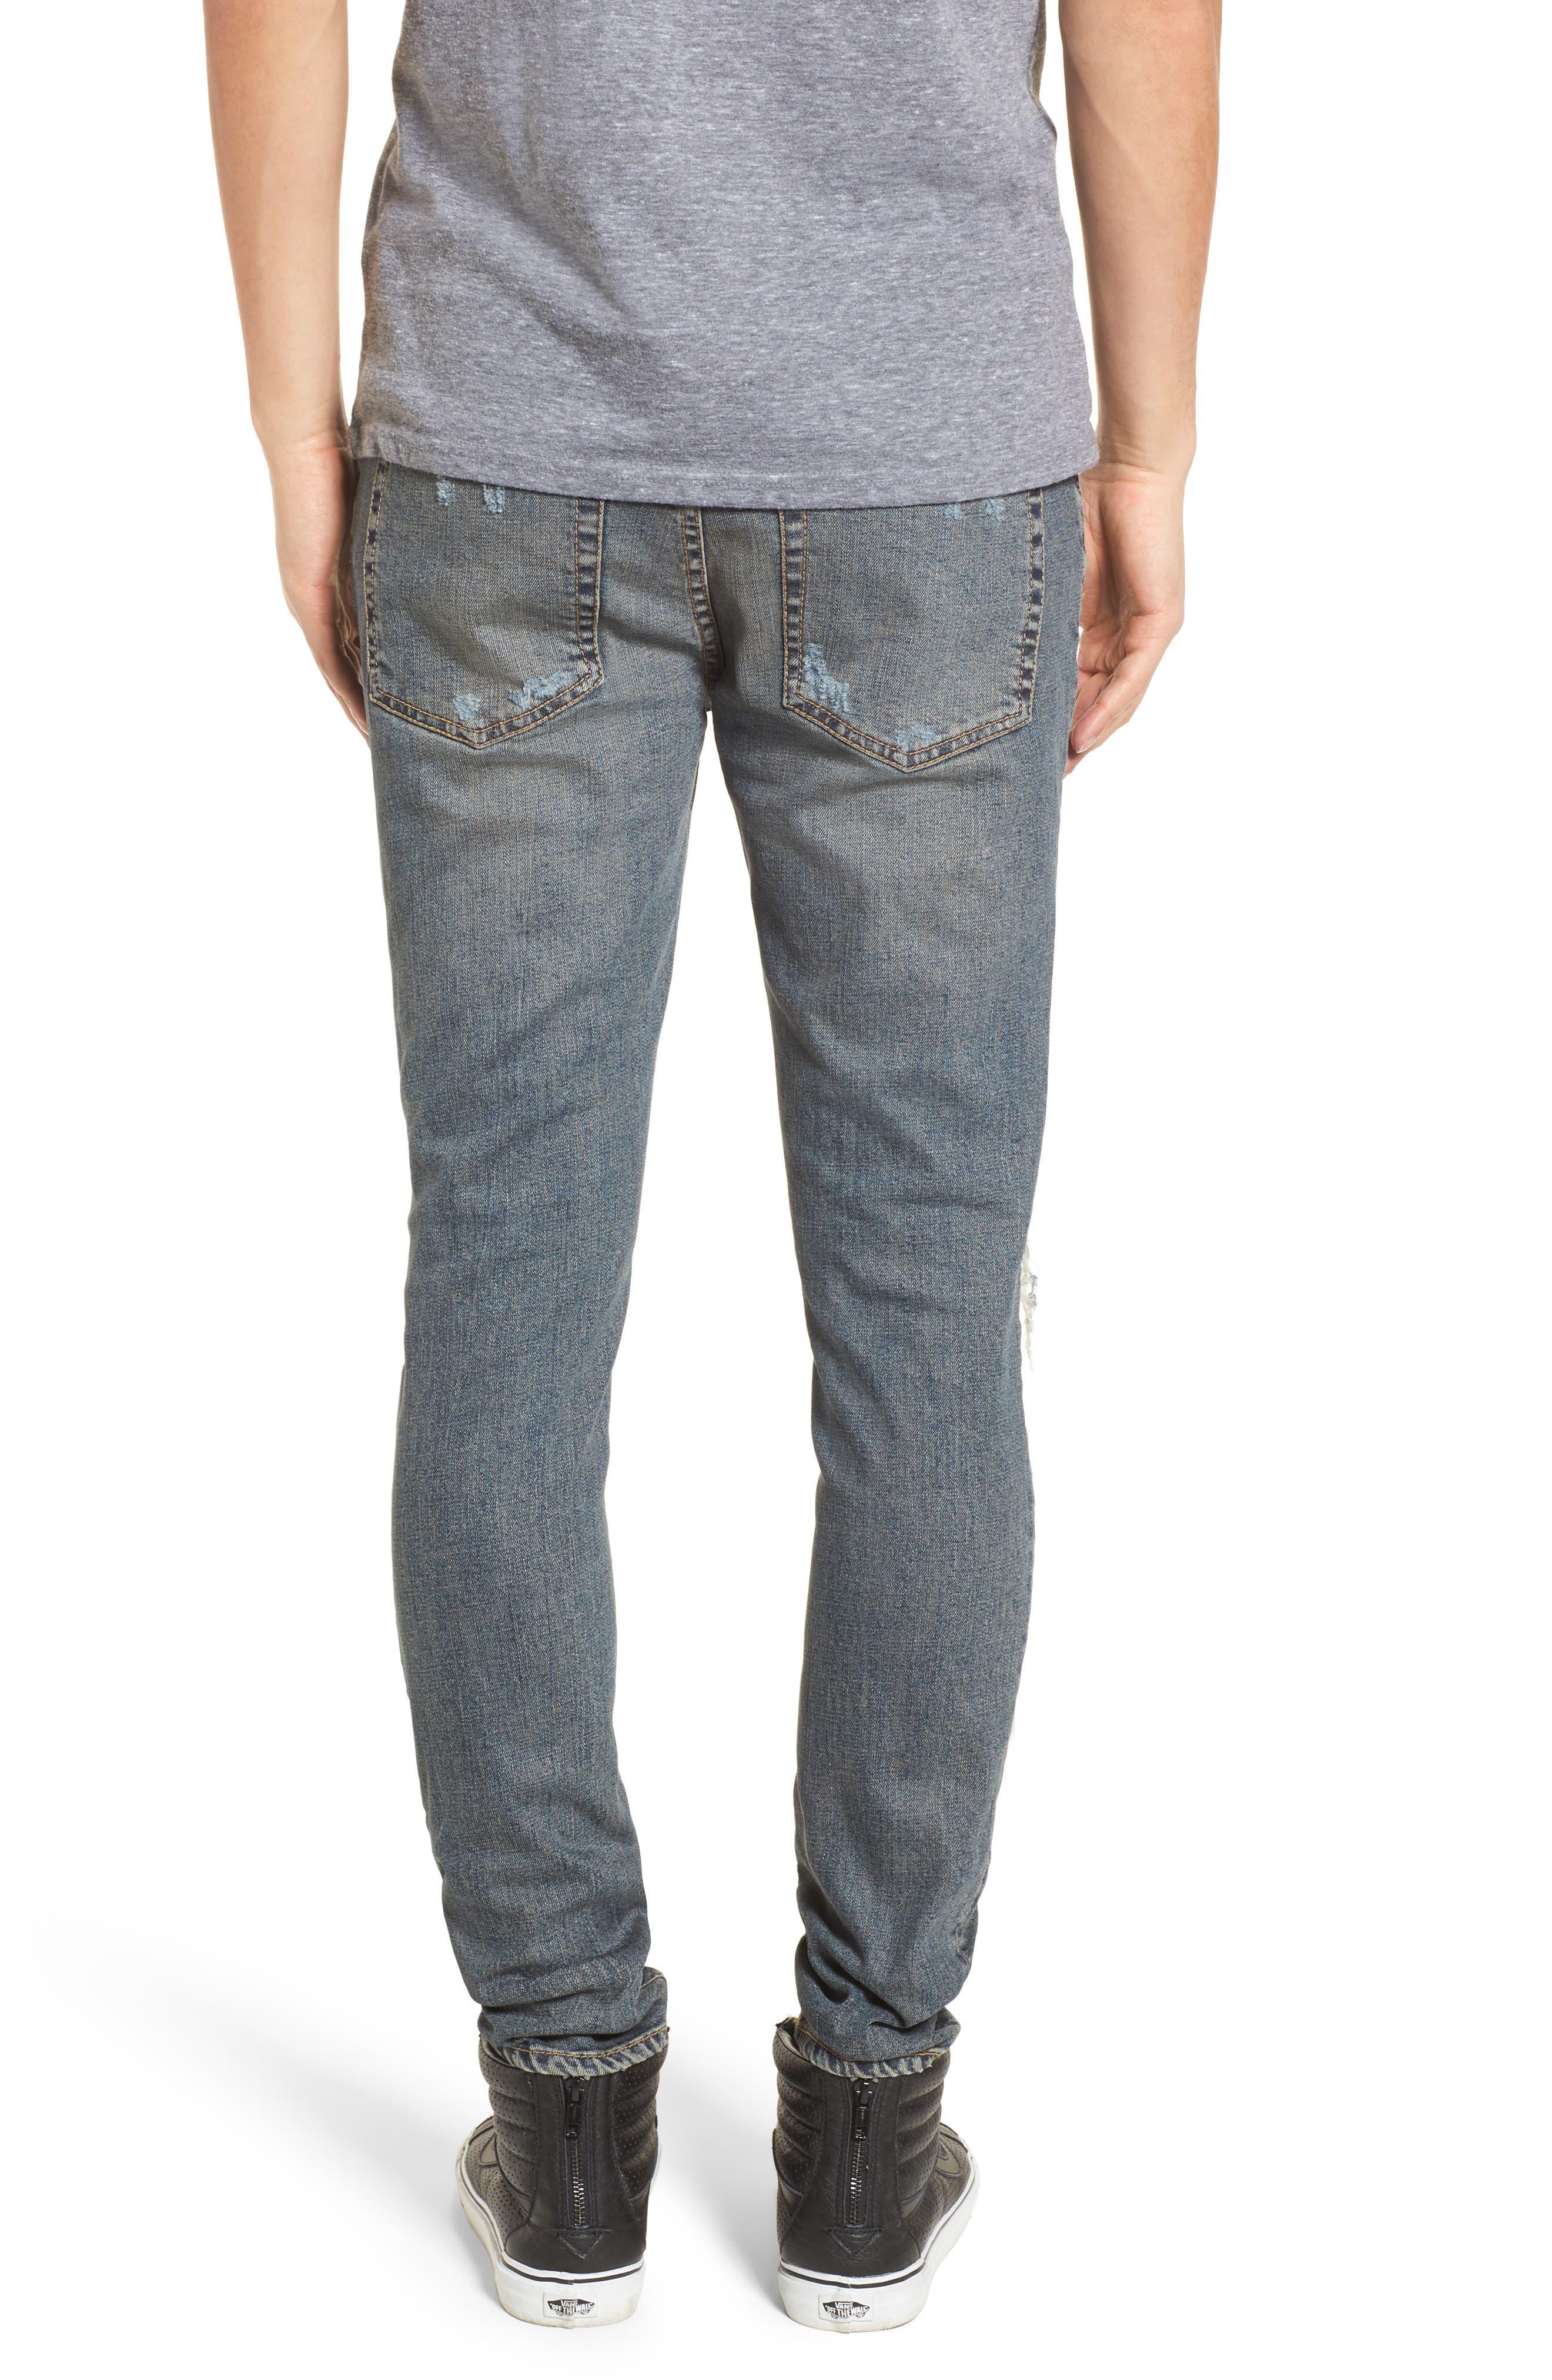 Repairer Slim Fit Denim Pants,                             Alternate thumbnail 2, color,                             Rockstar Blue